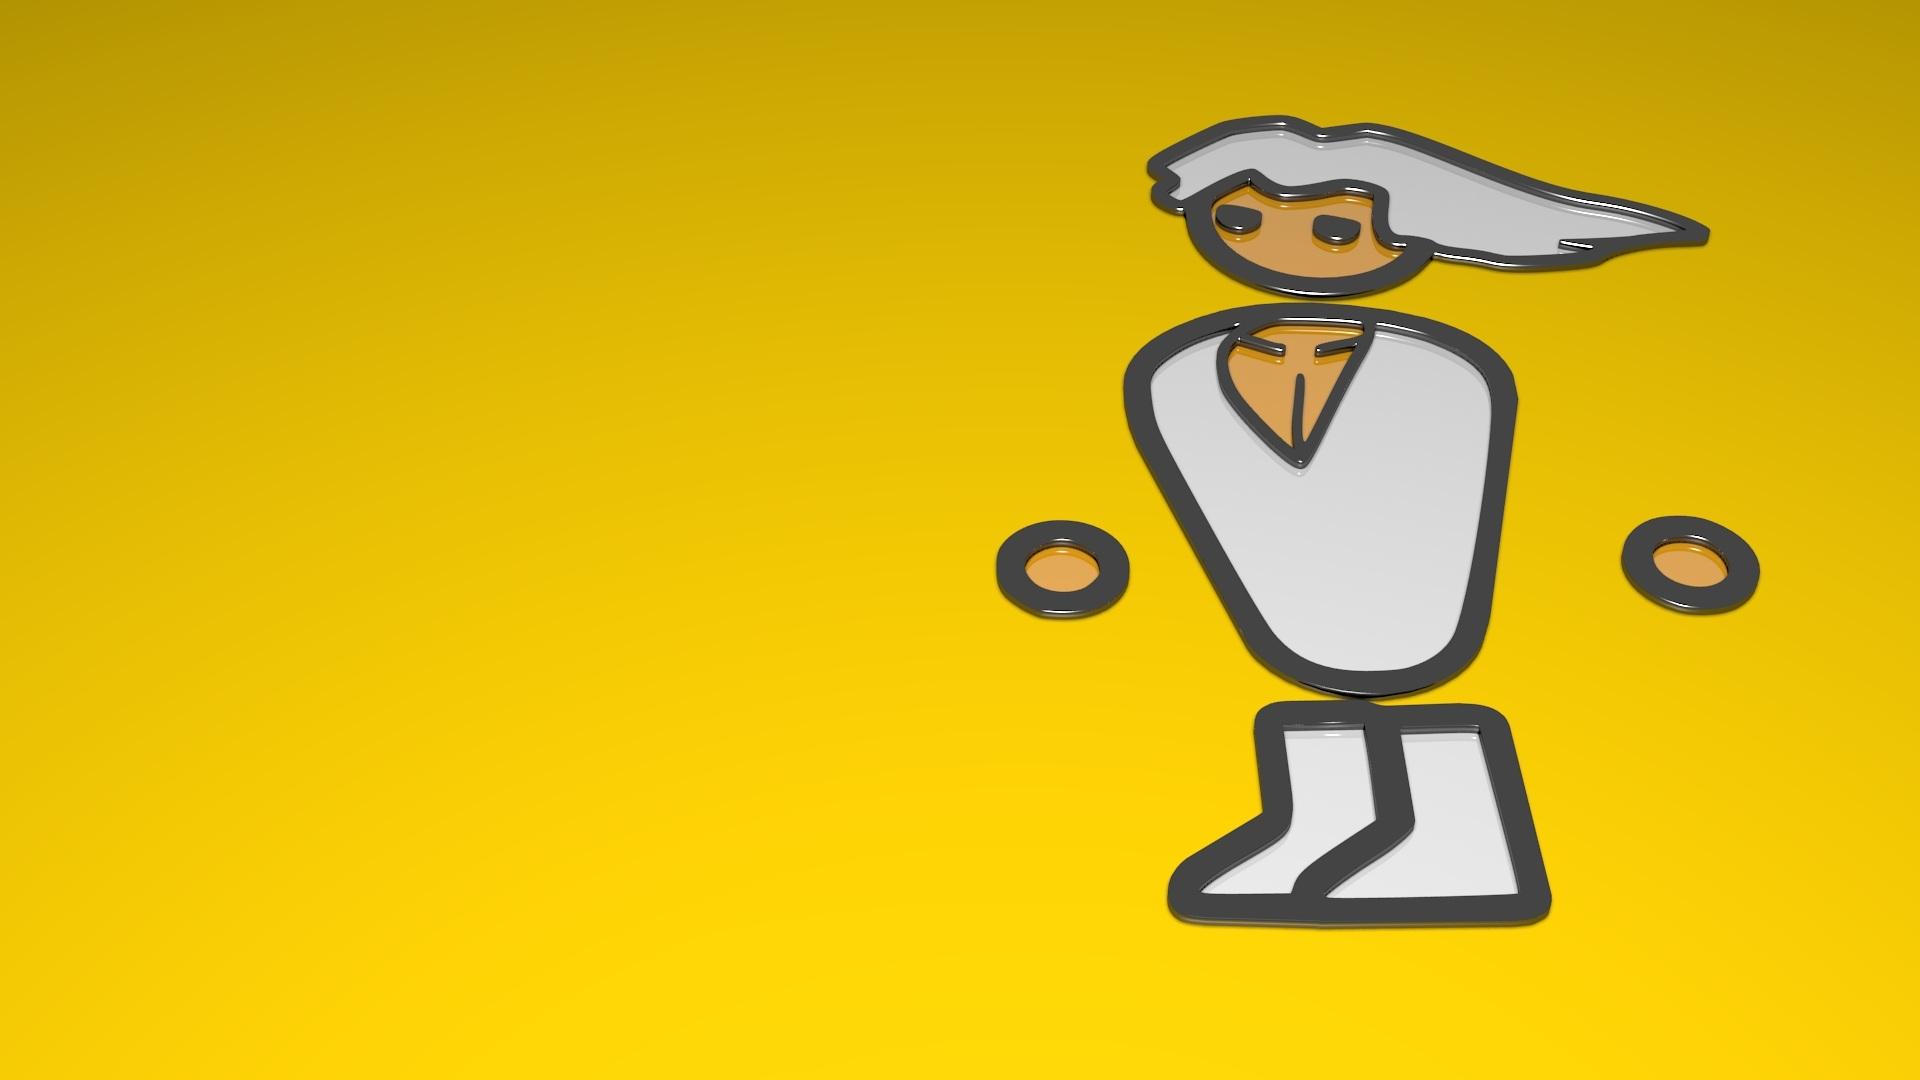 Gambar Video Game Kuning Fon Ilustrasi Logo Gambar Kartun